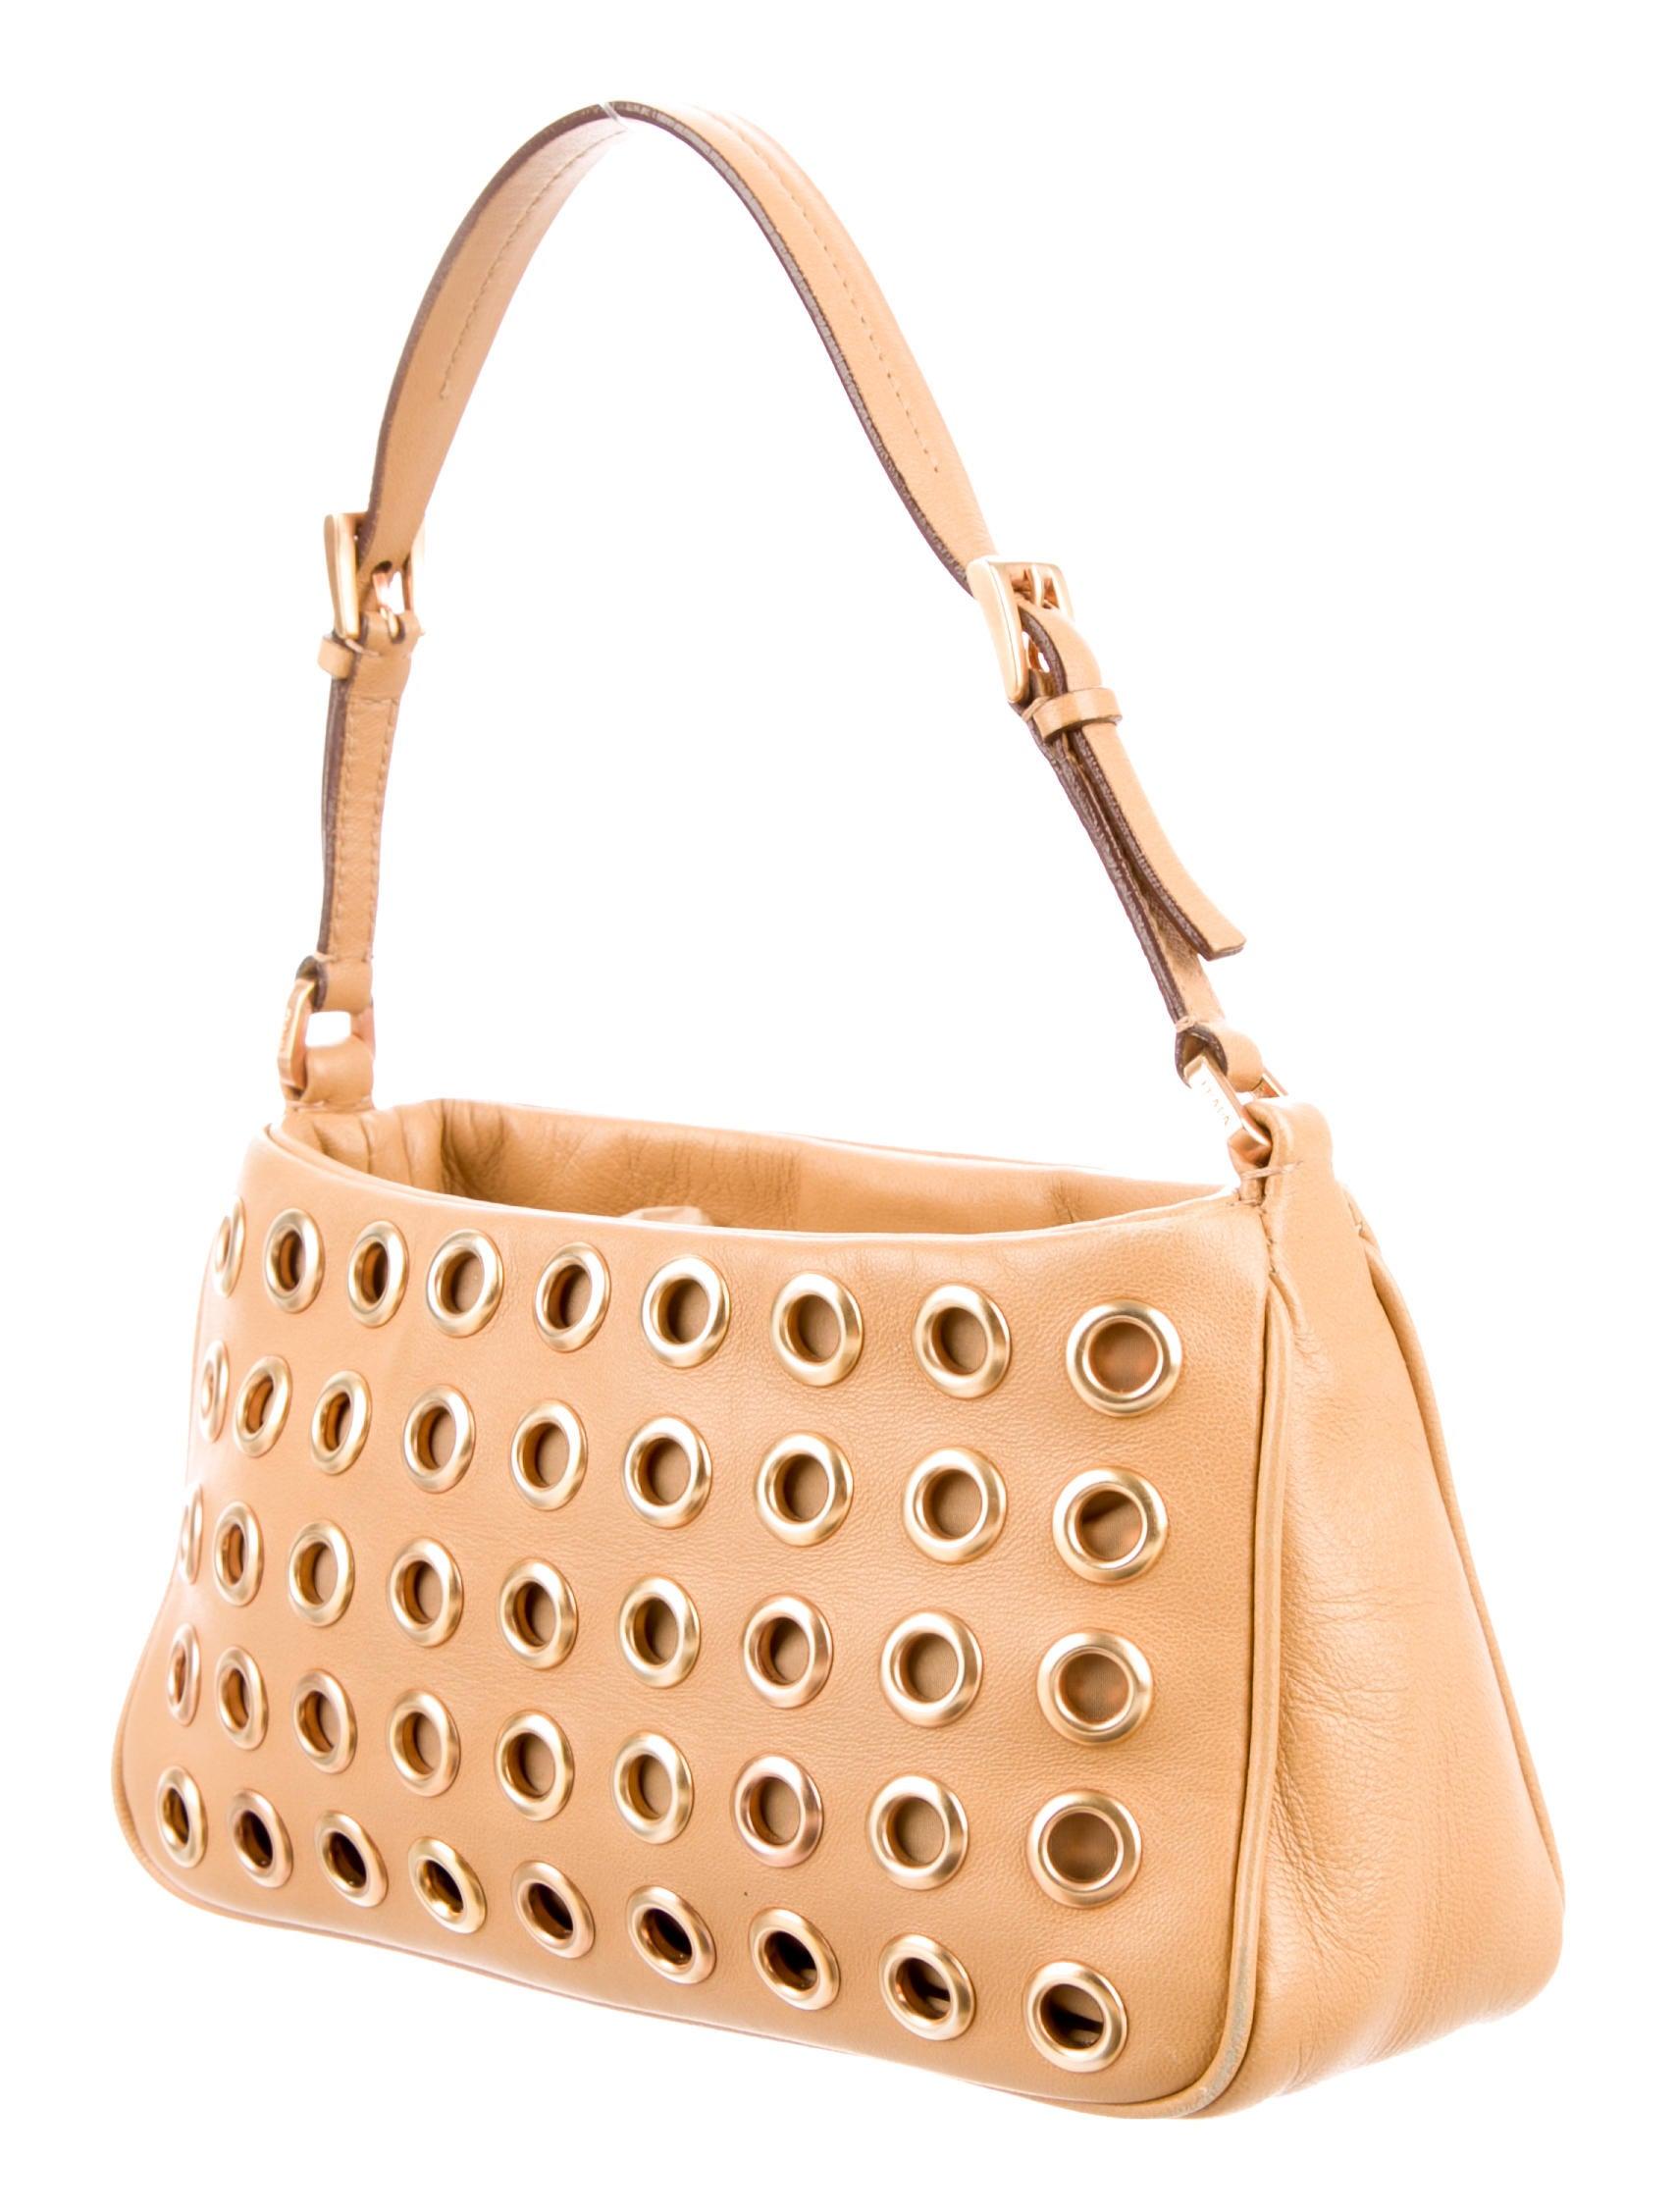 prada messenger bag black - prada nappa mini pochette, prada brown leather wallet